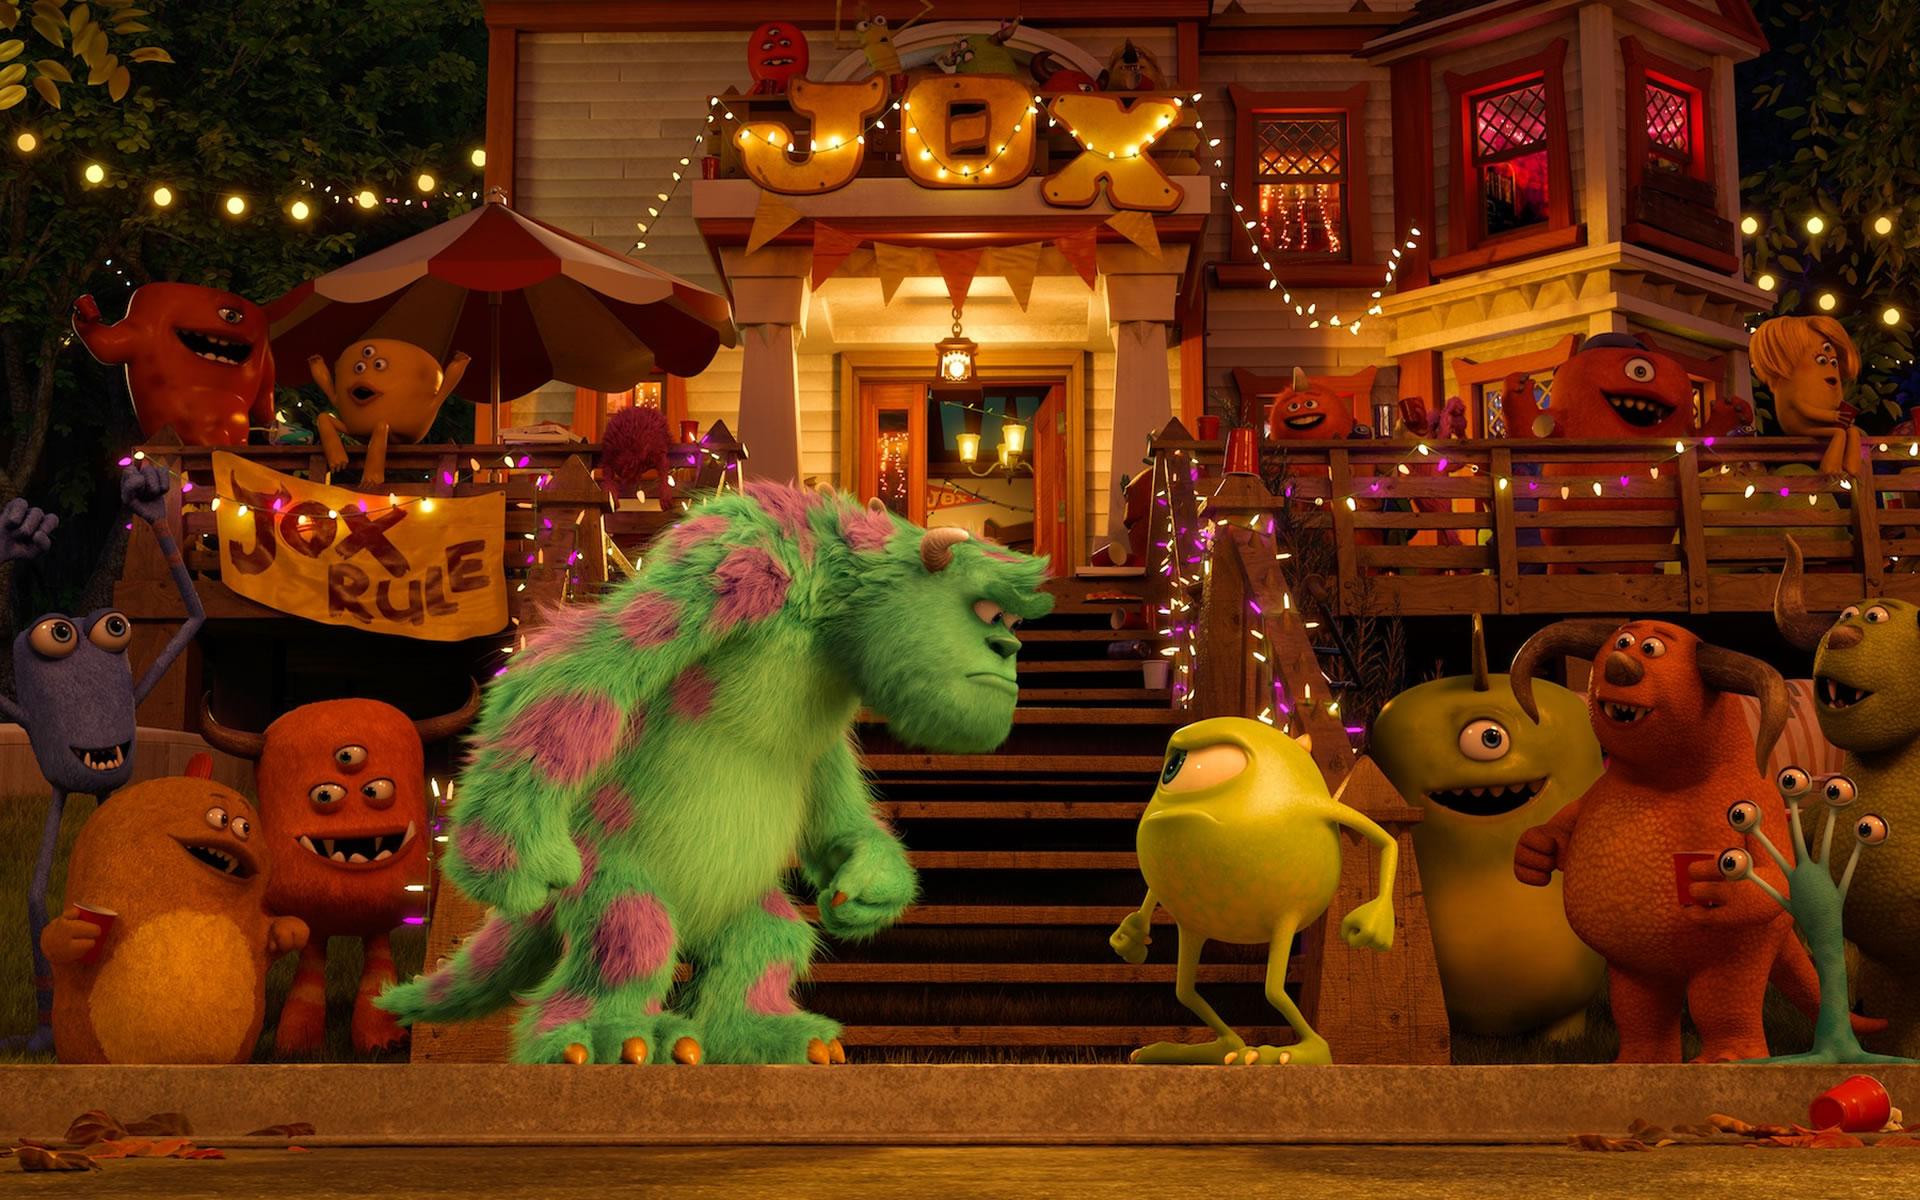 Mike Vs Sulley Cara a Cara Monsters University.